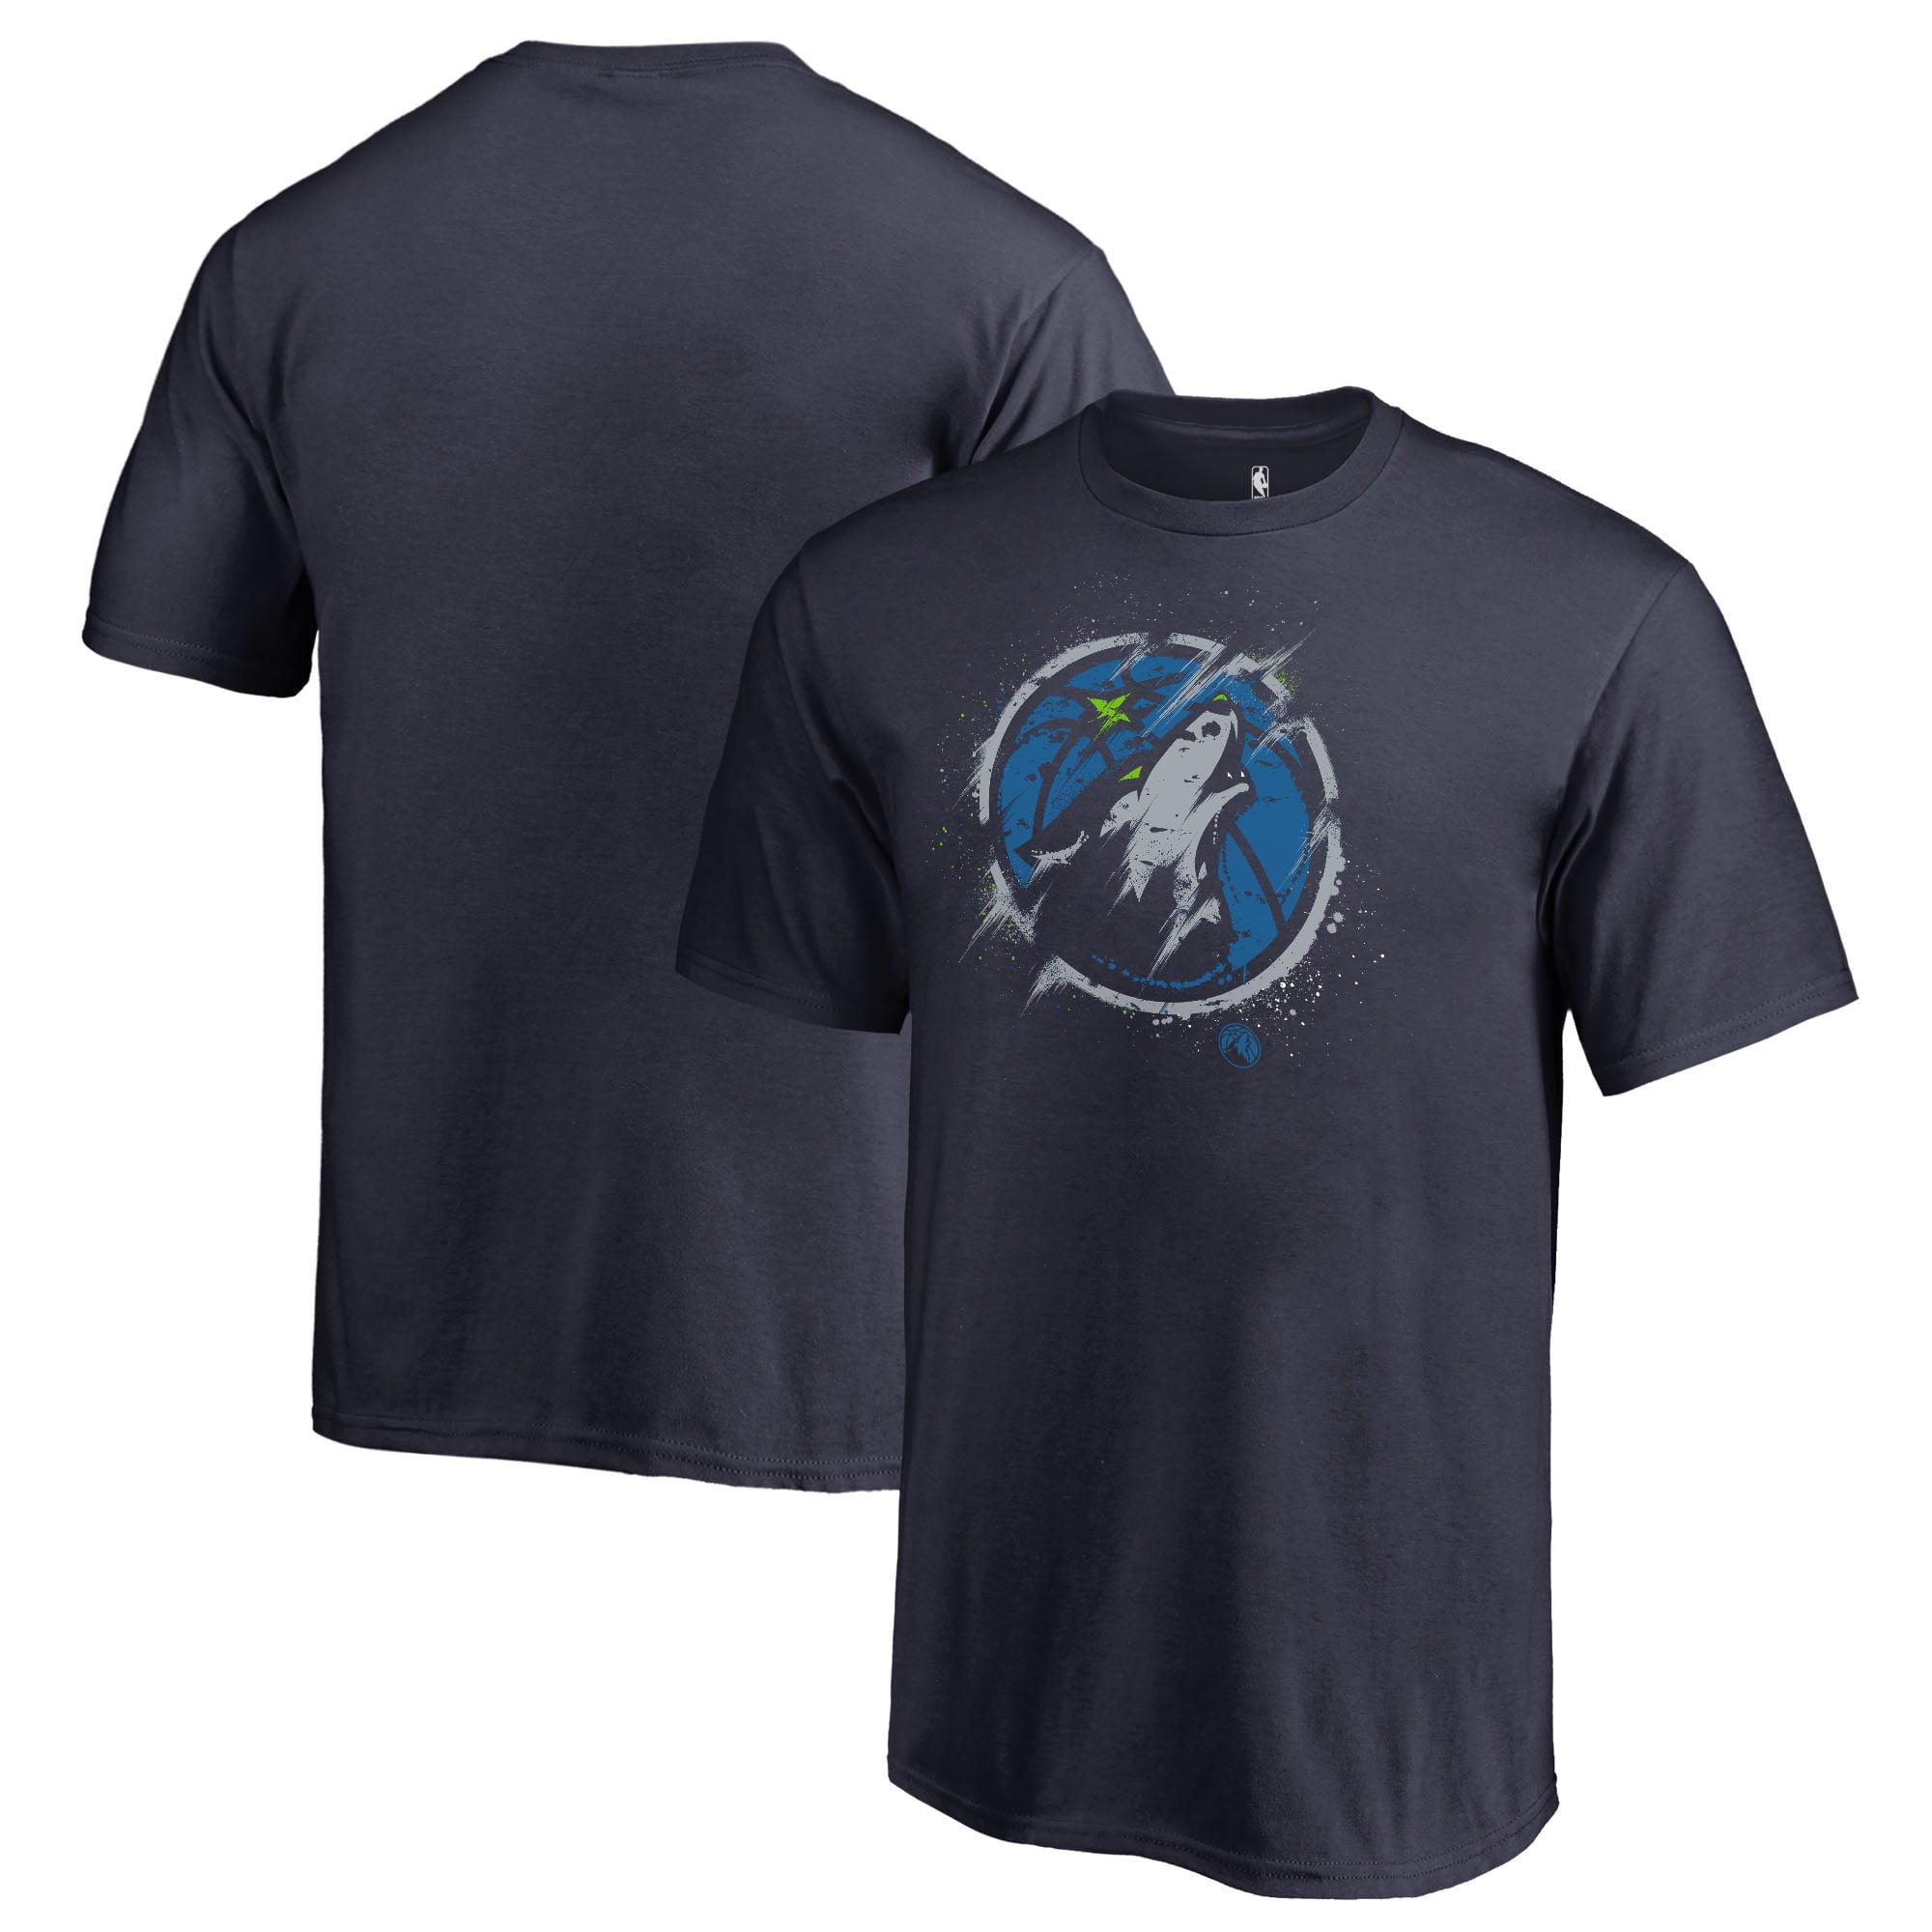 Minnesota Timberwolves Fanatics Branded Youth Splatter Logo T-Shirt - Navy